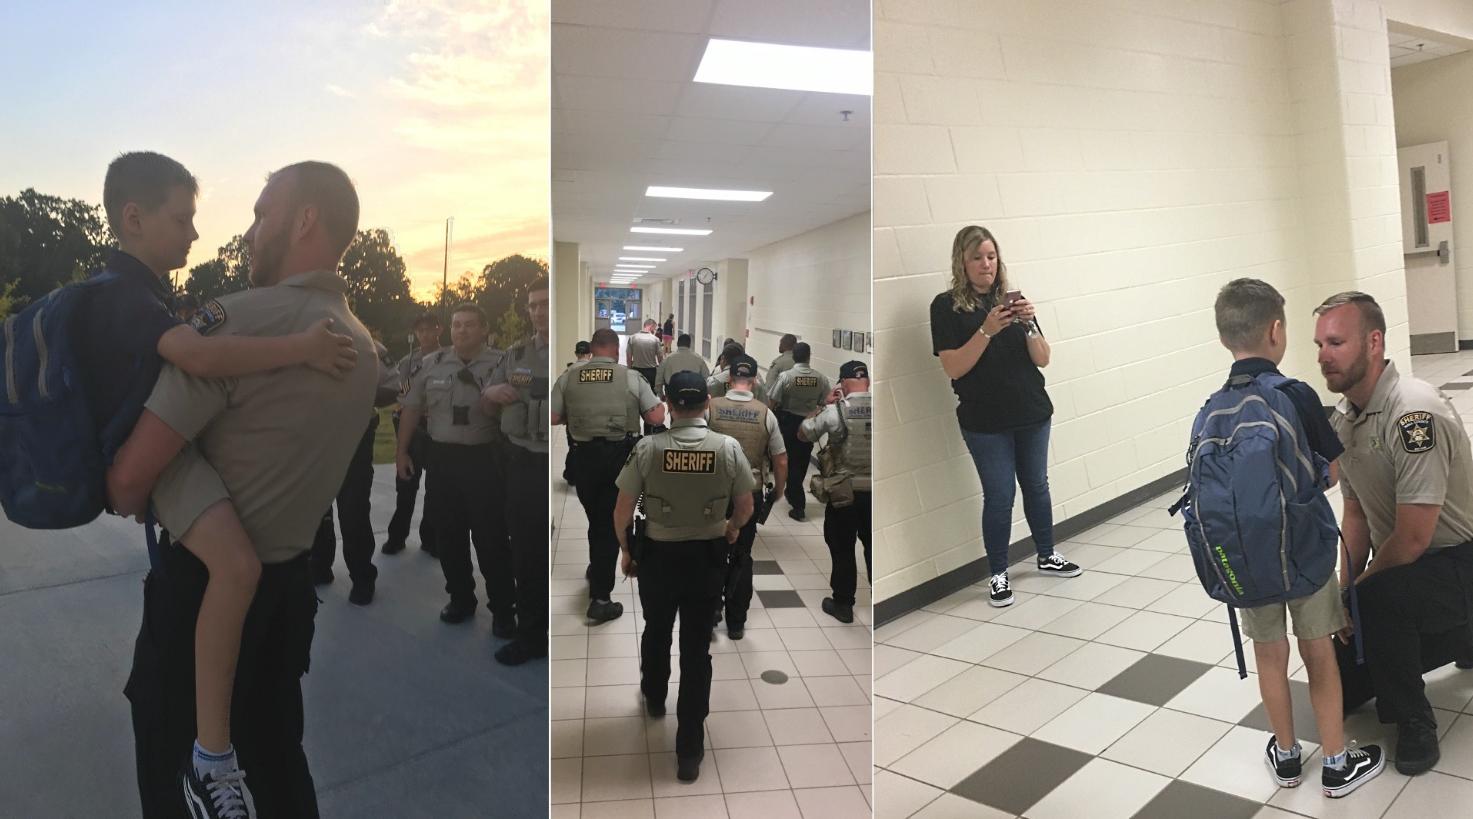 Georgia Deputies Escort Son of Slain Colleague to First Day of School